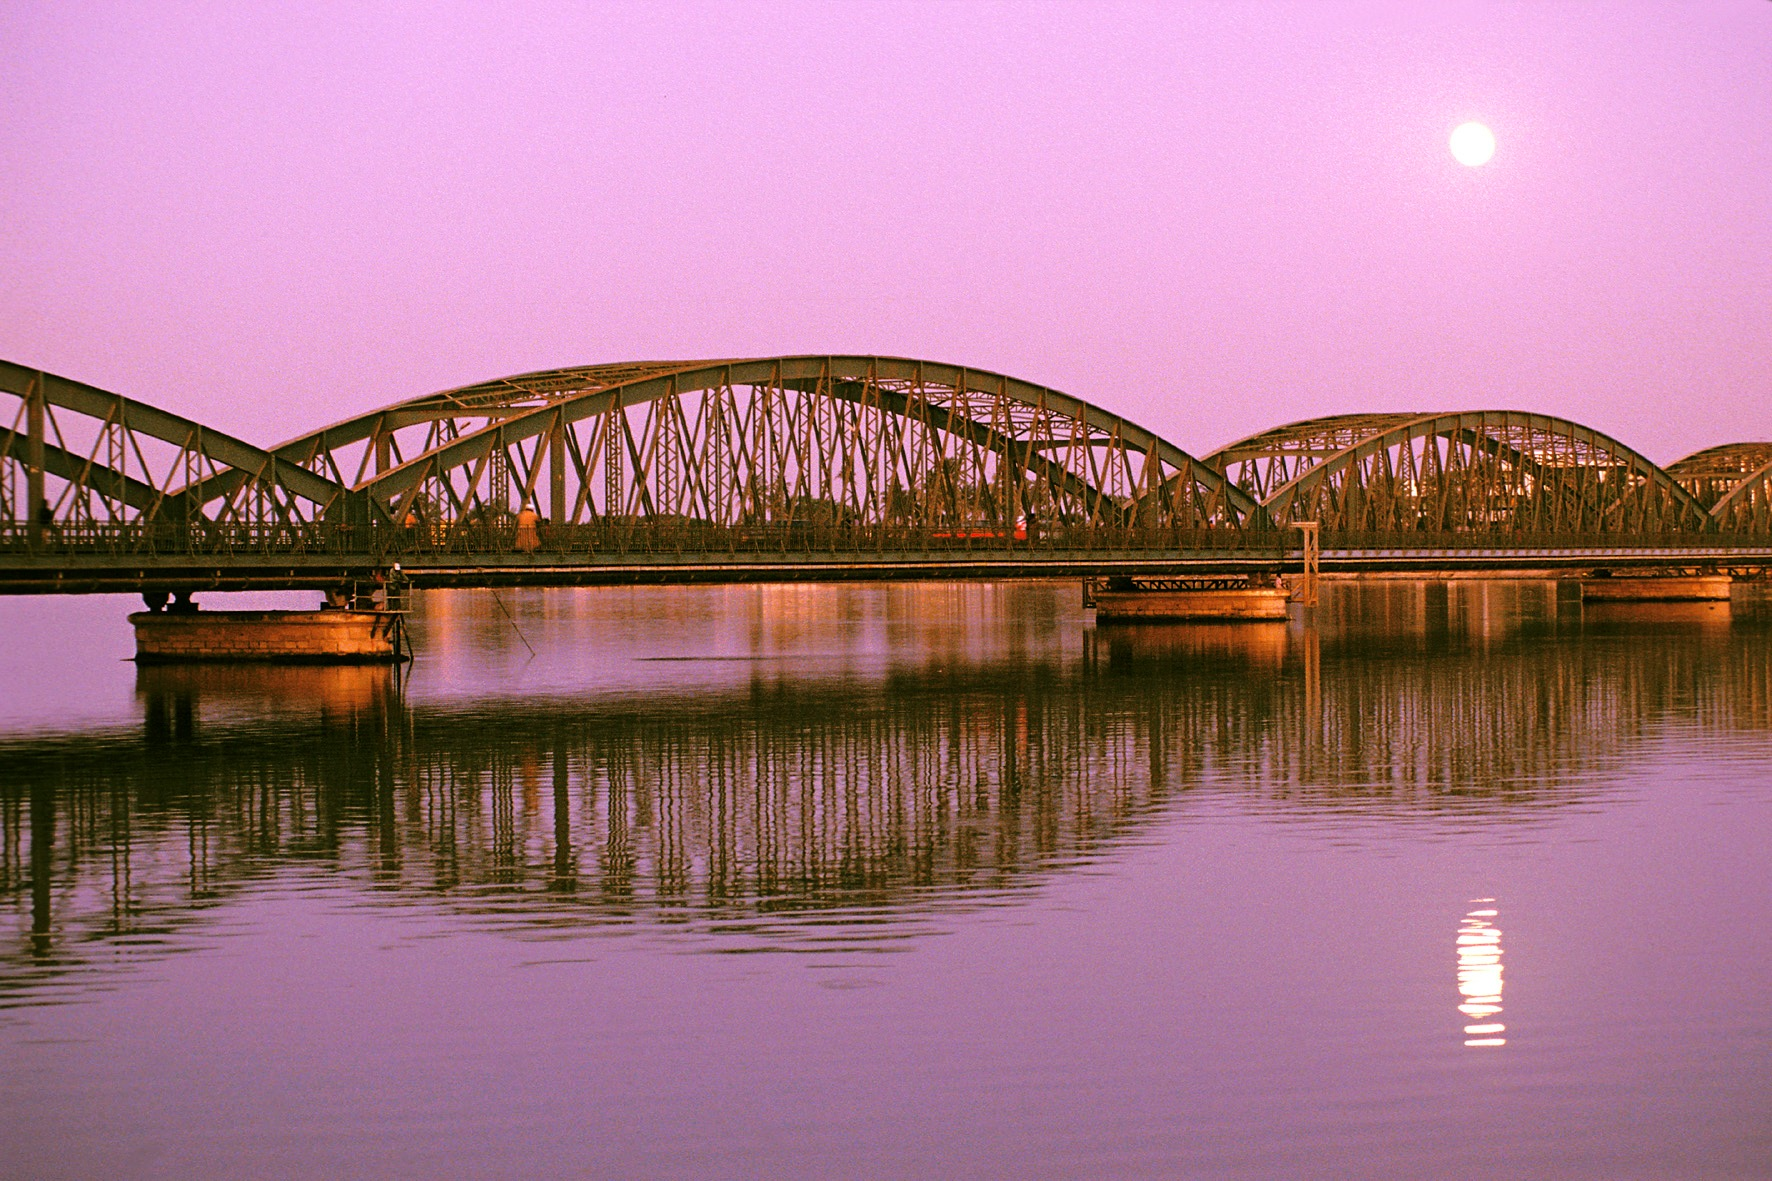 Le pont Faidherbe